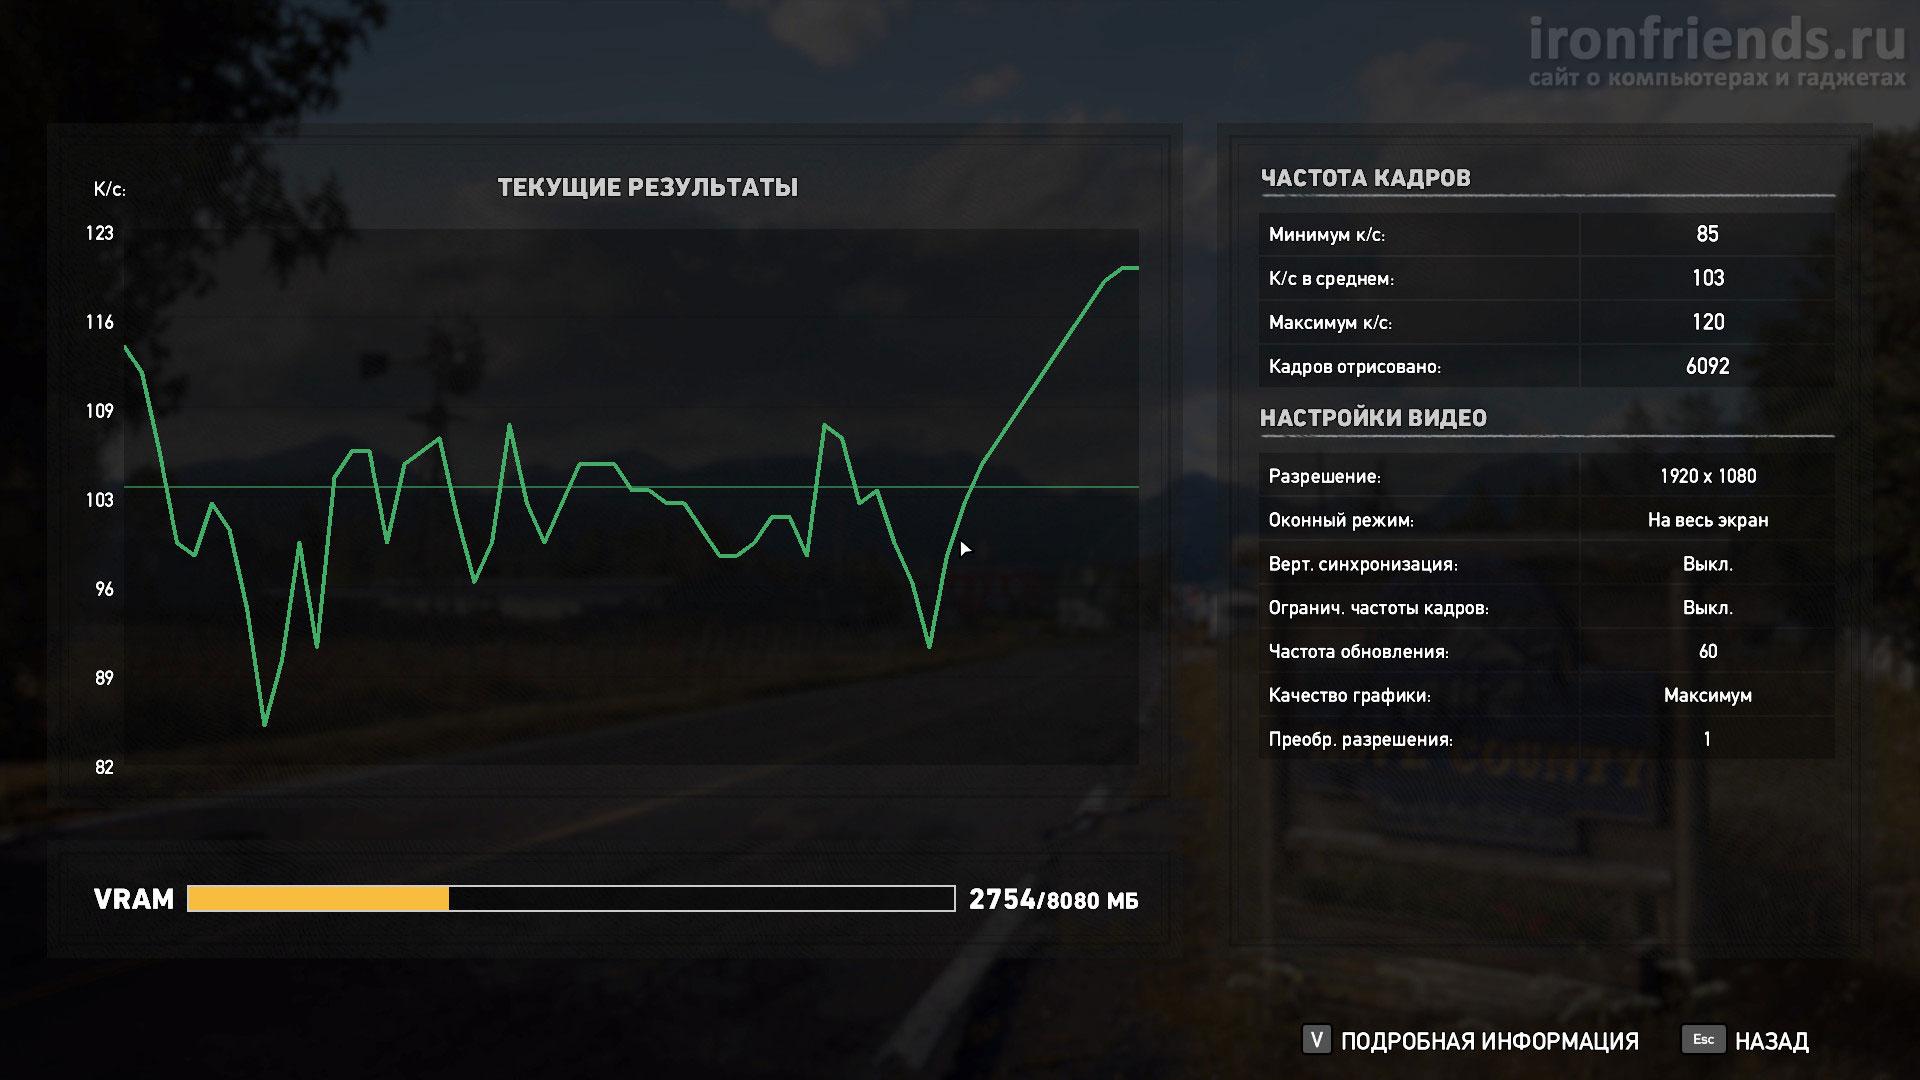 Gigabyte GTX 1070 Ti в Far Cry 5